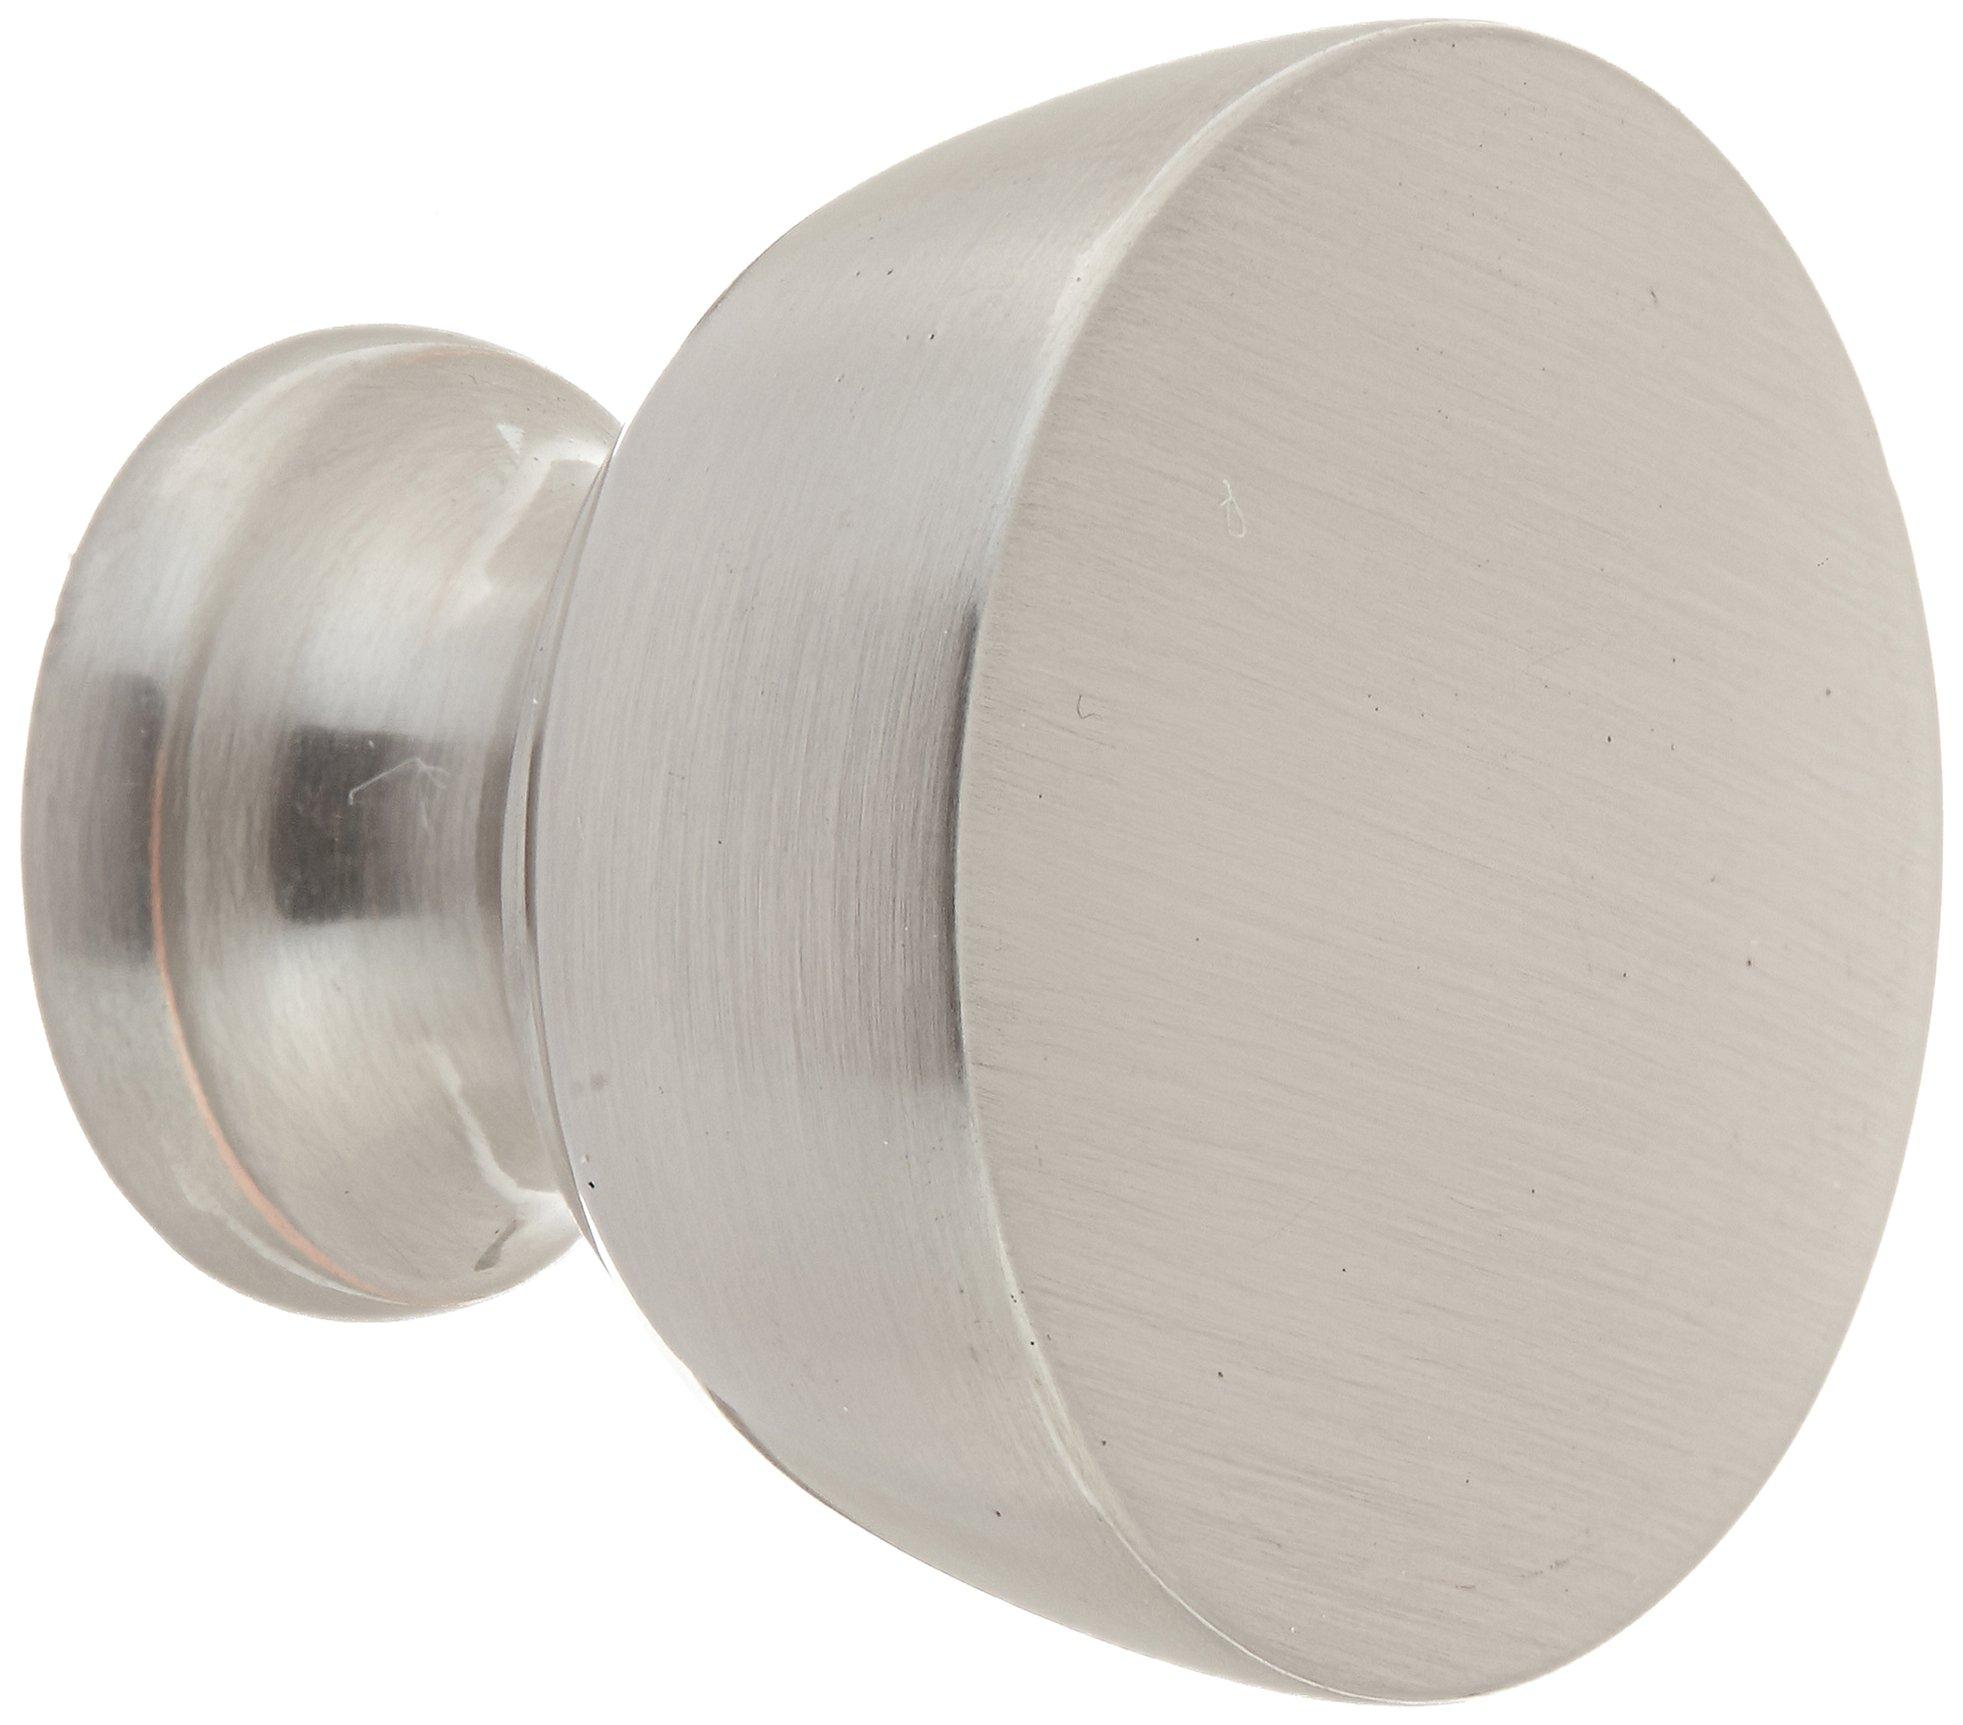 Southern Hills Brushed Nickel Cabinet Knobs - Pack of 5 -Satin Nickel Drawer Pulls - Round - Pack of 5 - Kitchen Hardware SHKM013-SN-5